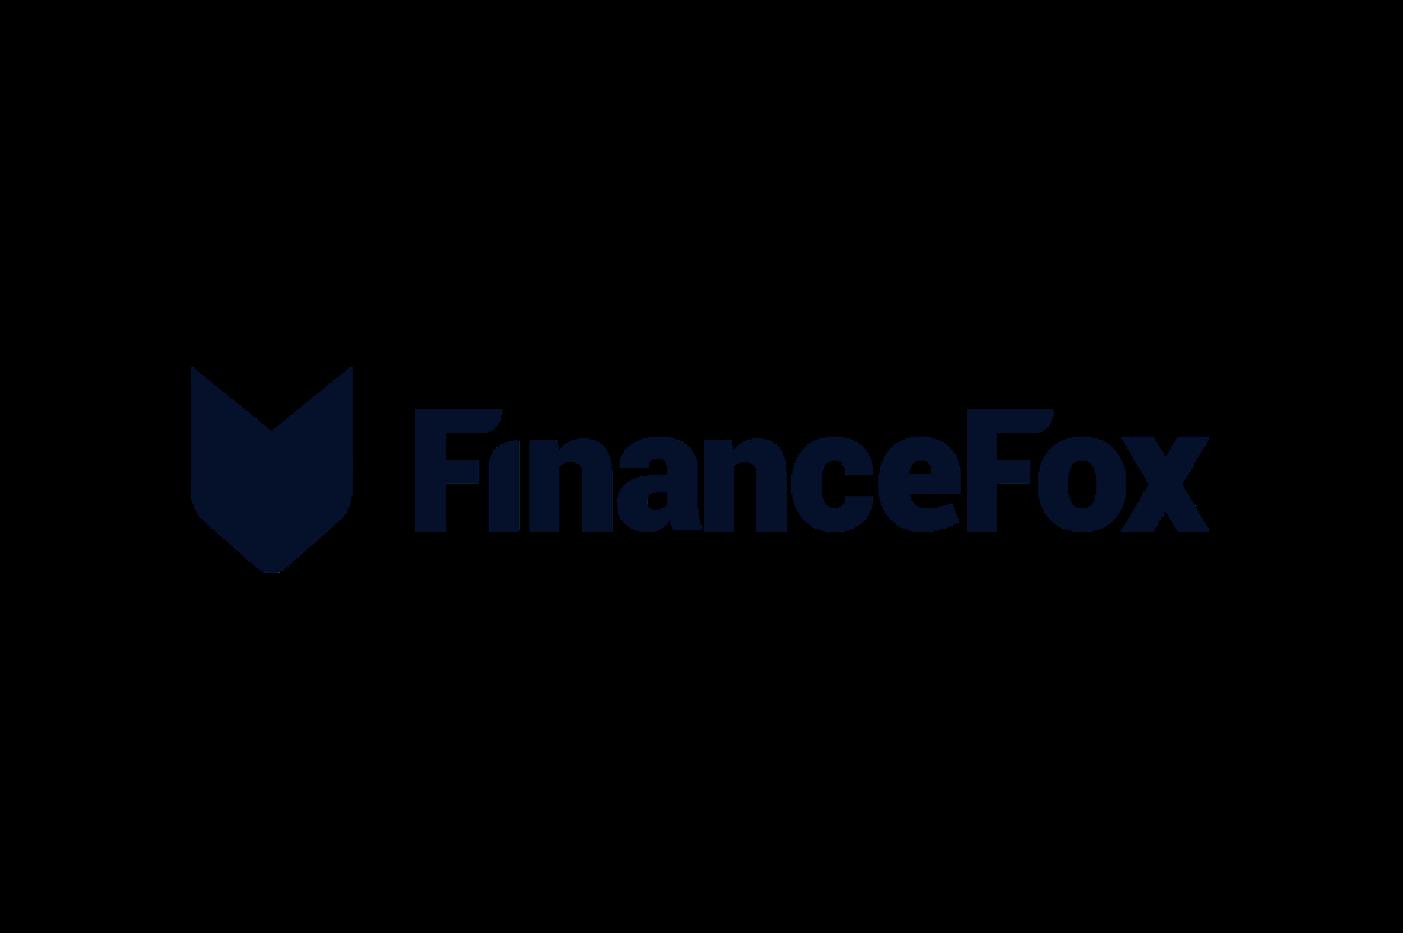 FinanceFox